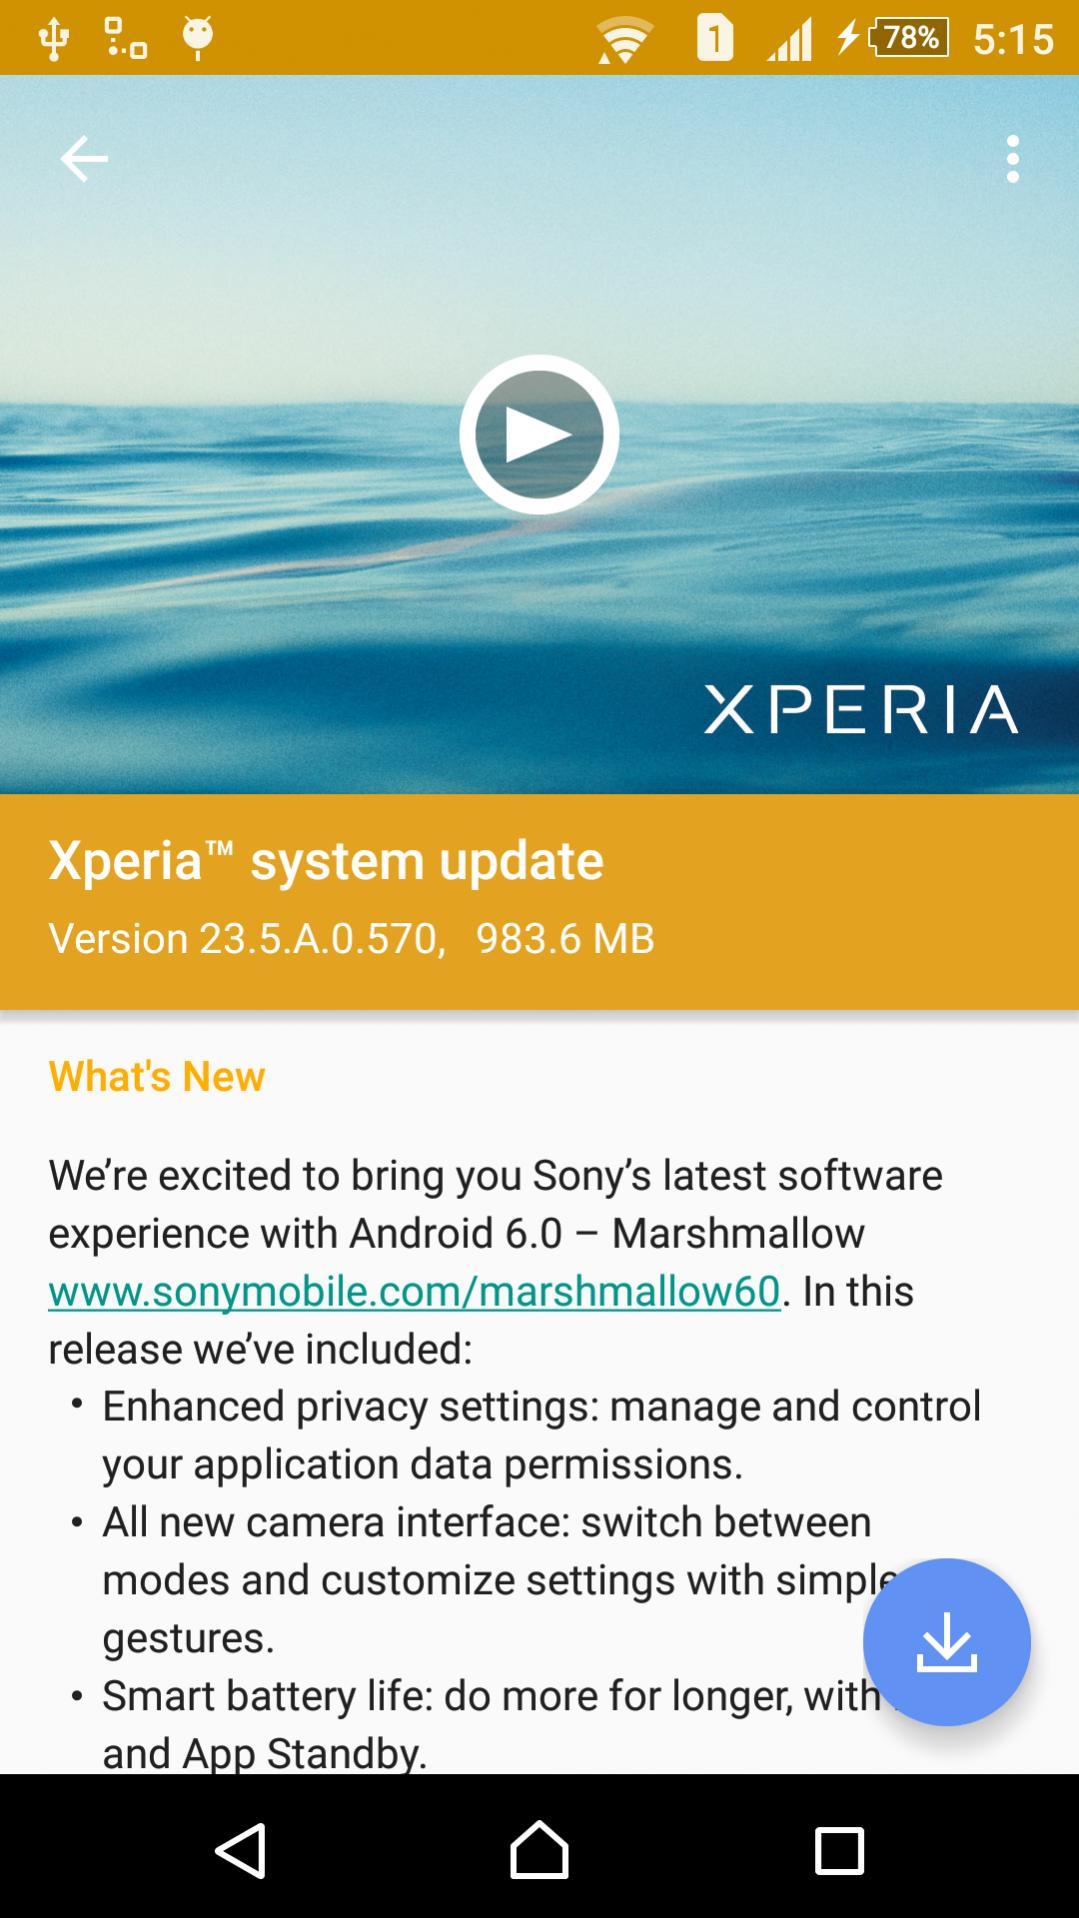 23.5.A.0.570 firmware update for Xperia Z3 Dual